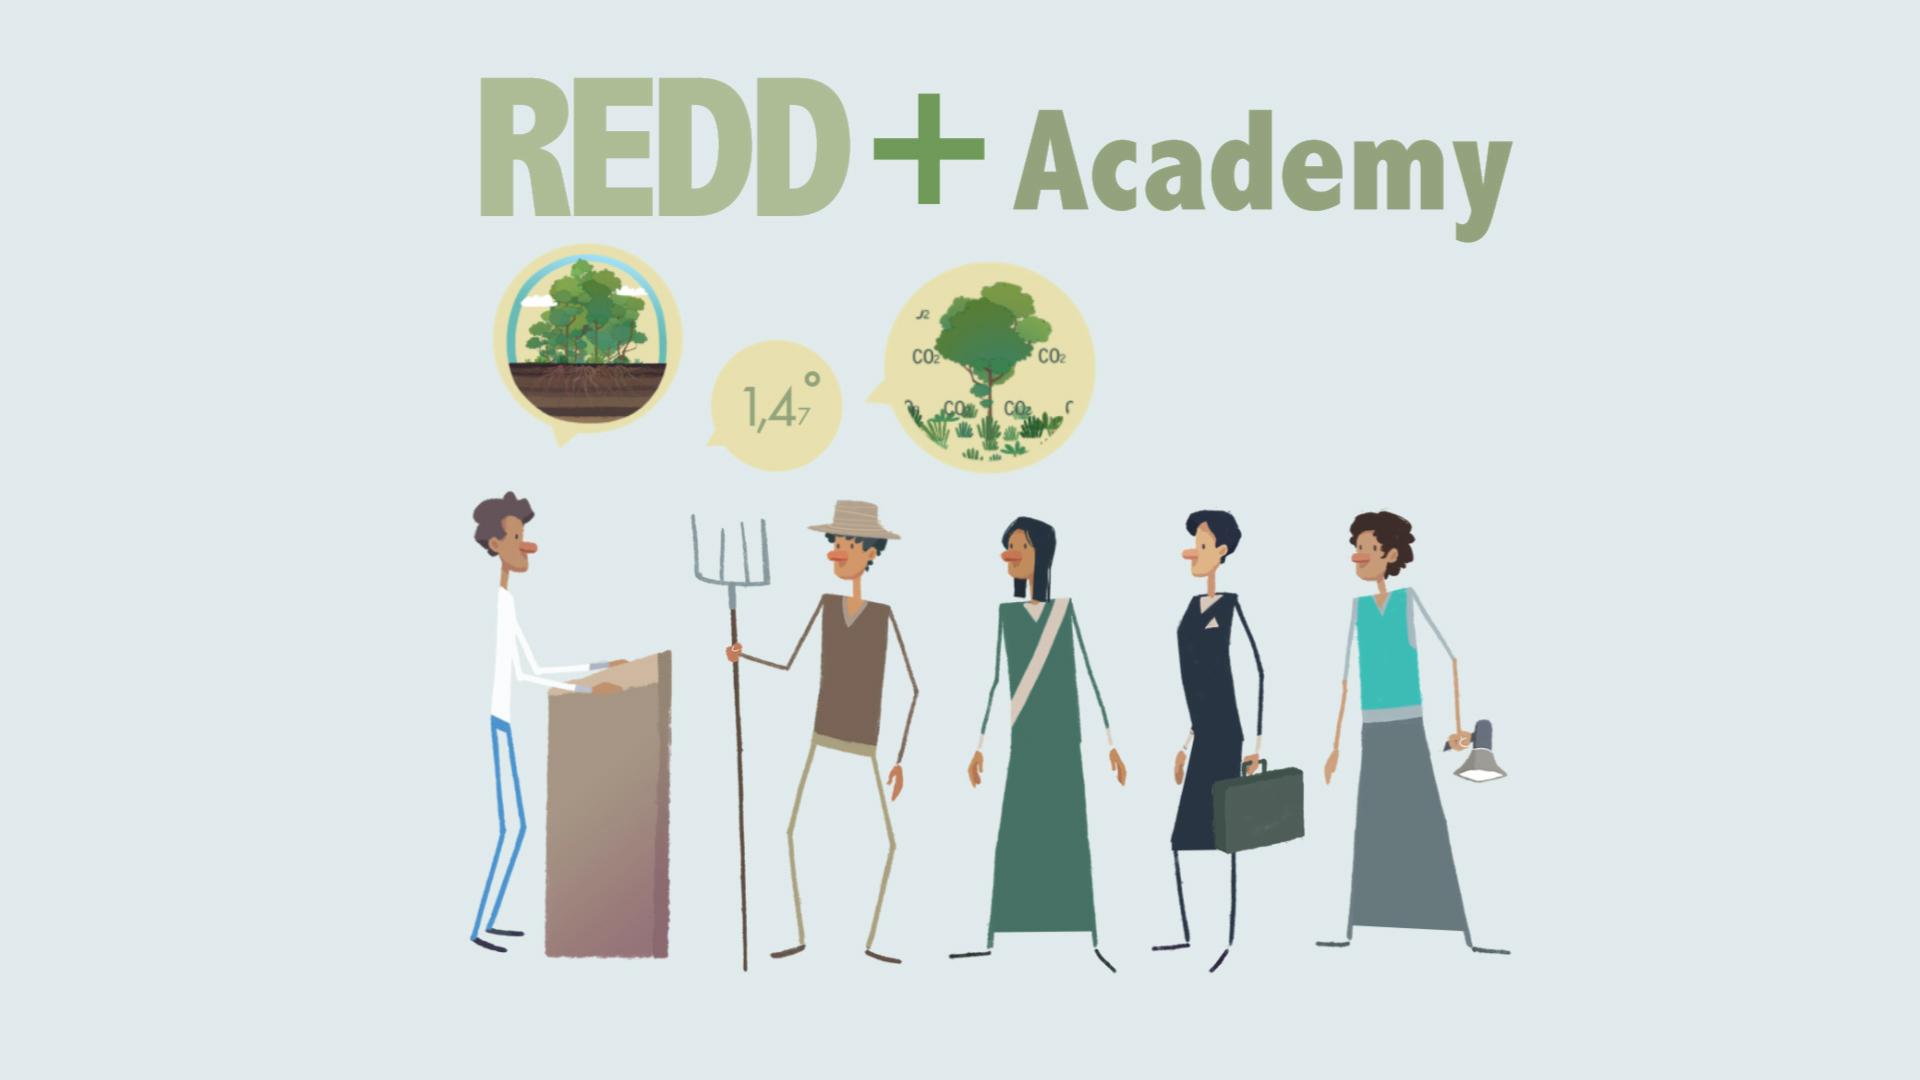 REDD+Academy stakeholders